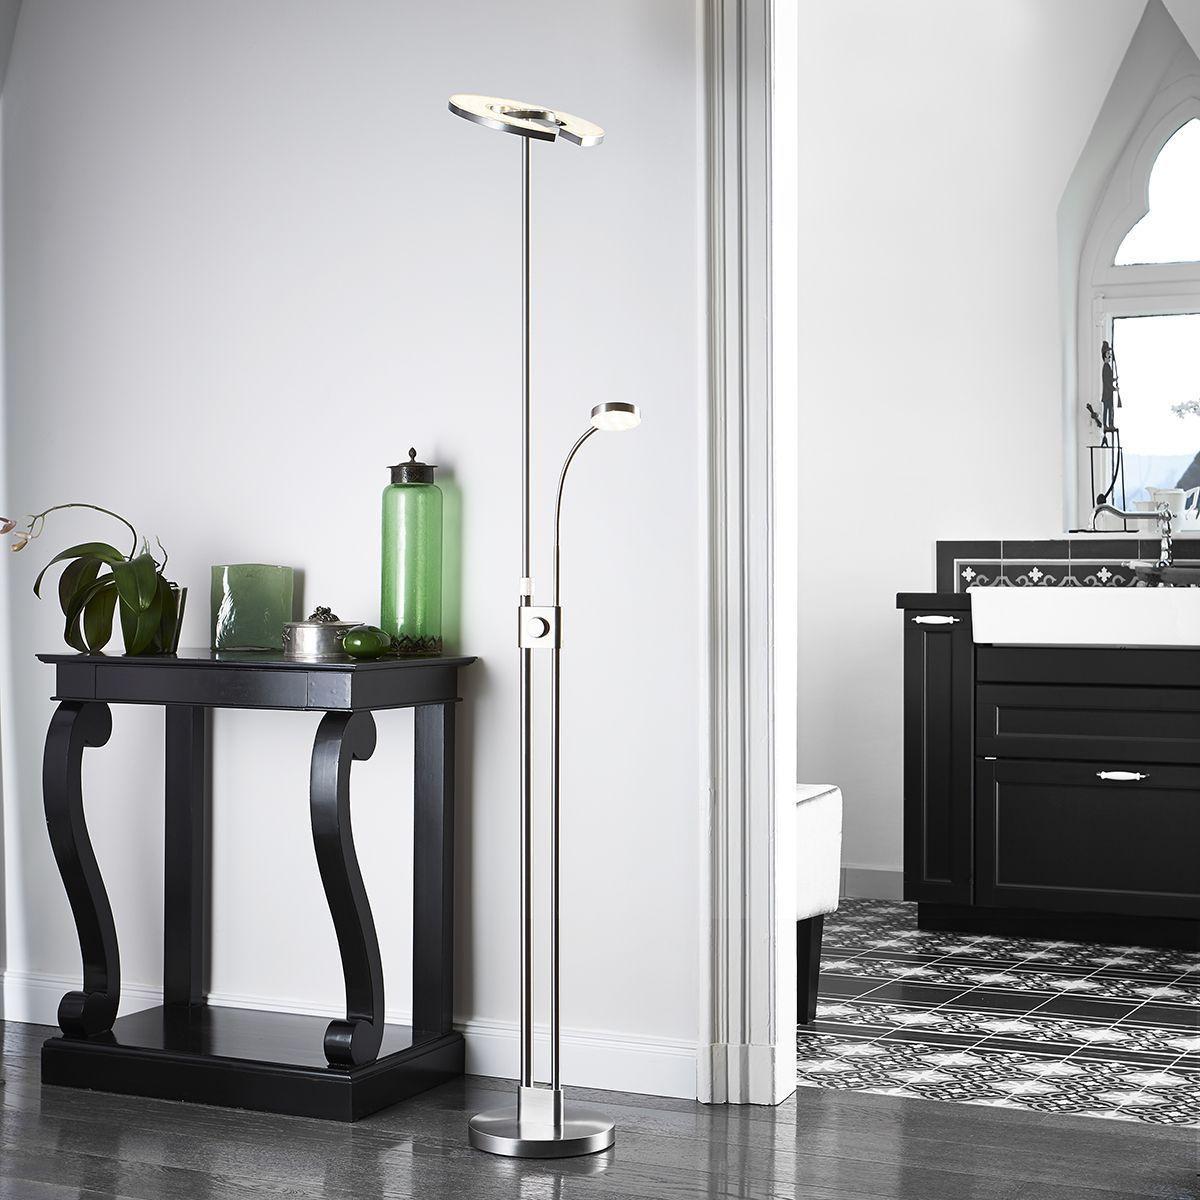 led stehleuchte stehlampe mit leseleuchte deckenfluter fluter dimmbar st13 bware ebay tische. Black Bedroom Furniture Sets. Home Design Ideas